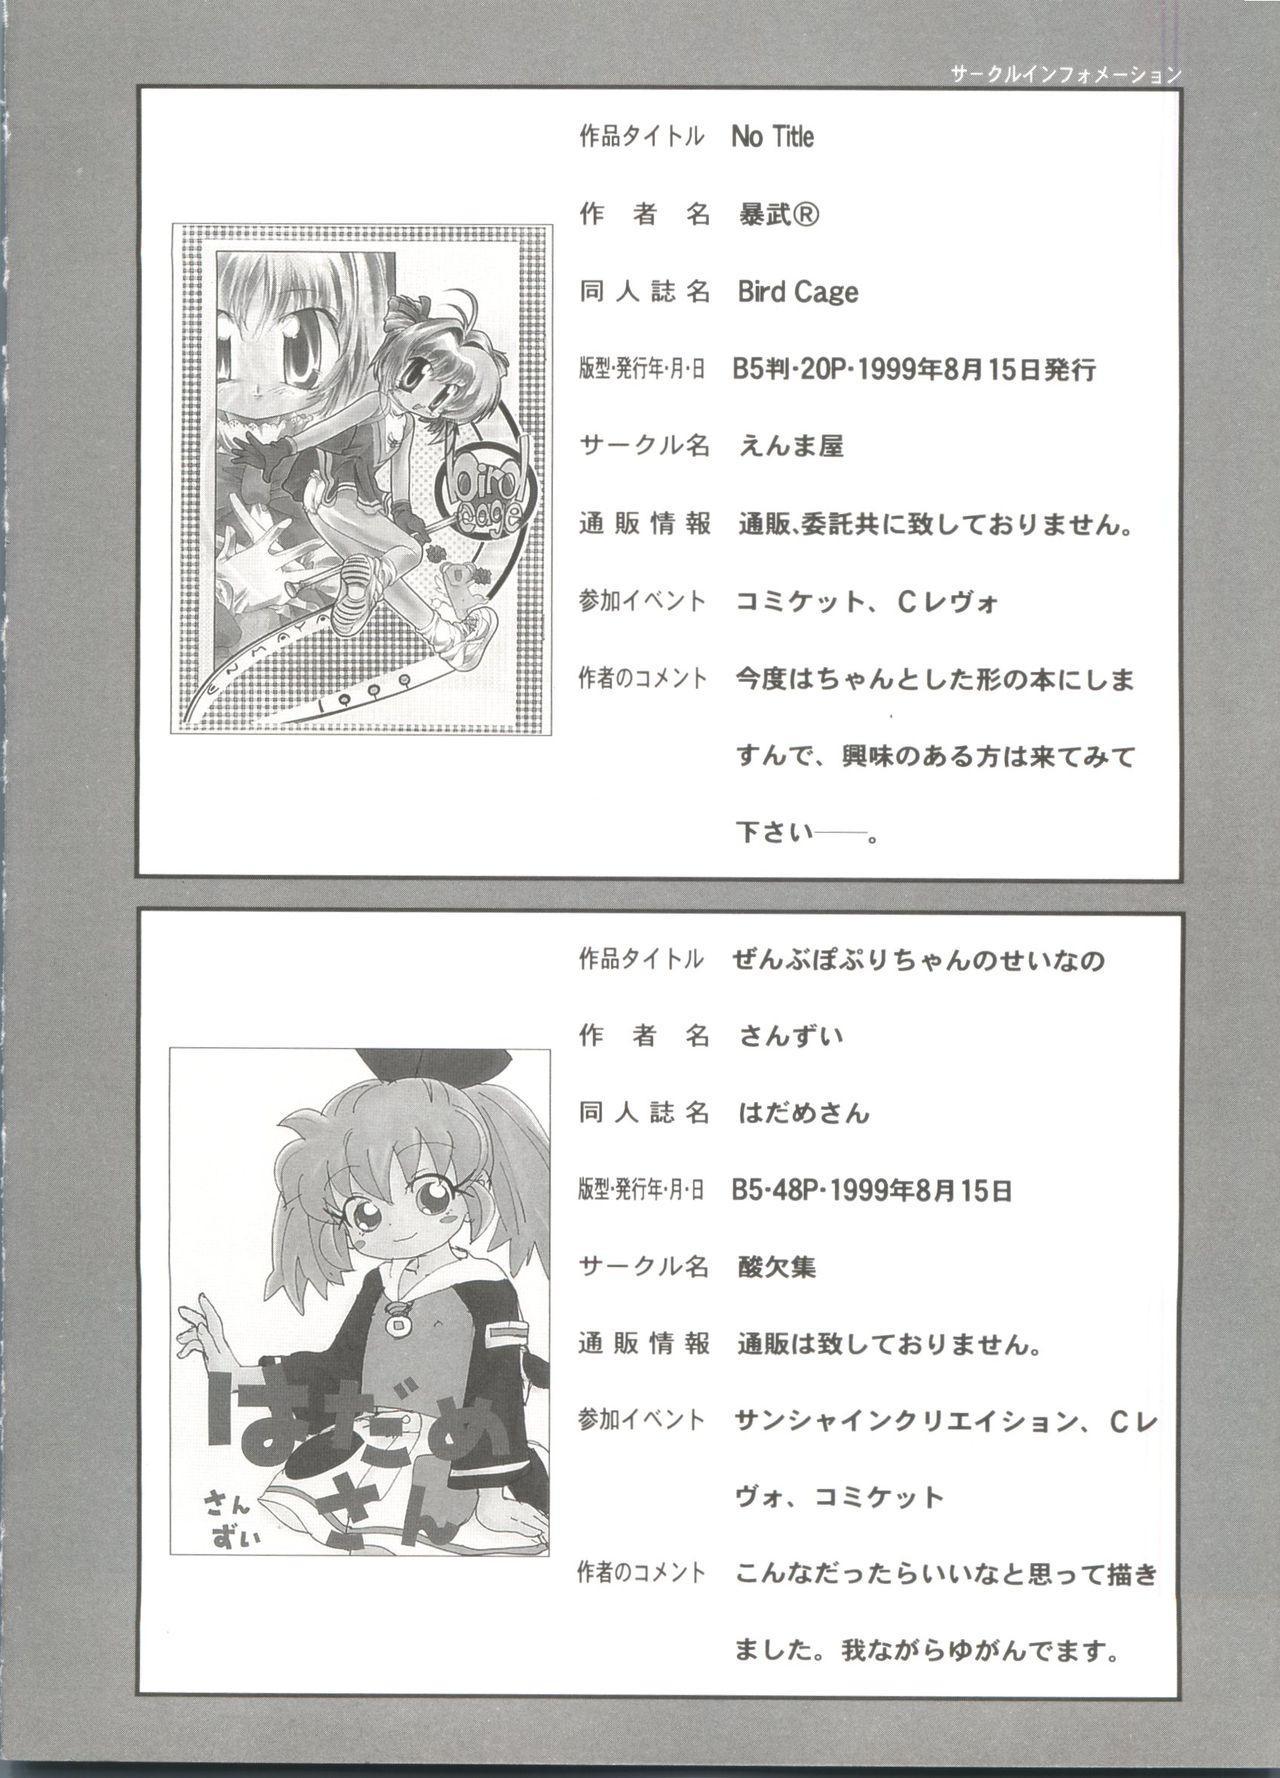 [Anthology] Denei Tamatebako 8 - Utakata no Tenshi-tachi II (Various) 141